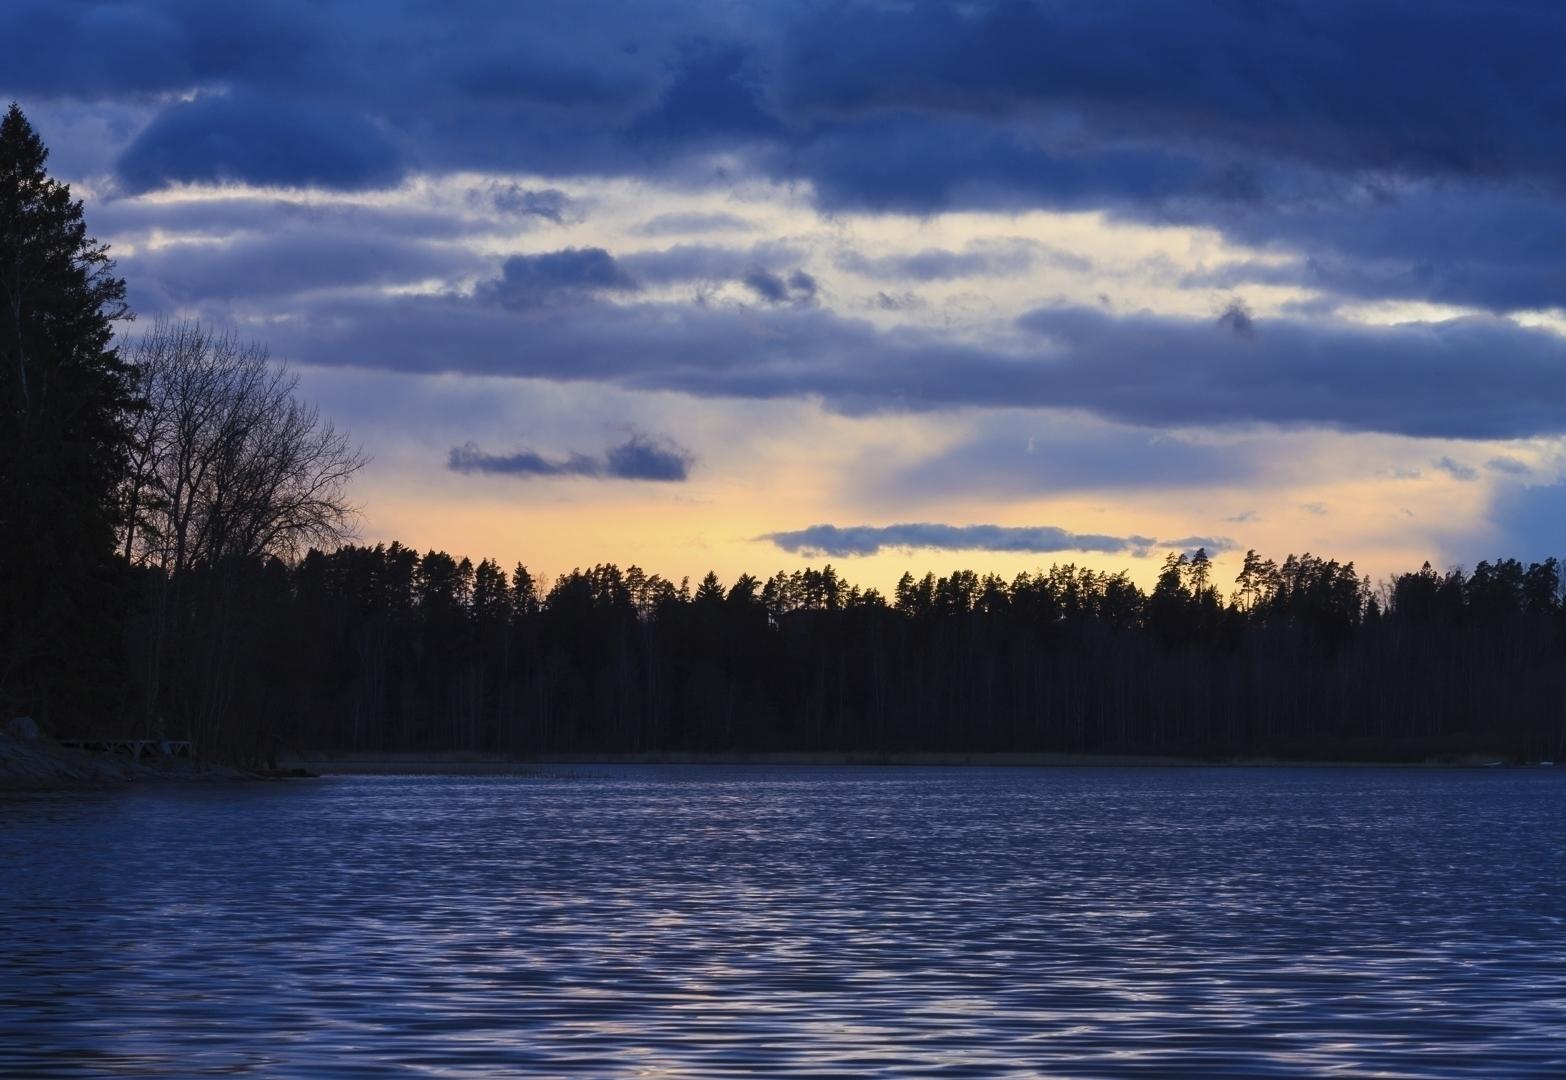 Blue eve - photography, finland - anttitassberg | ello